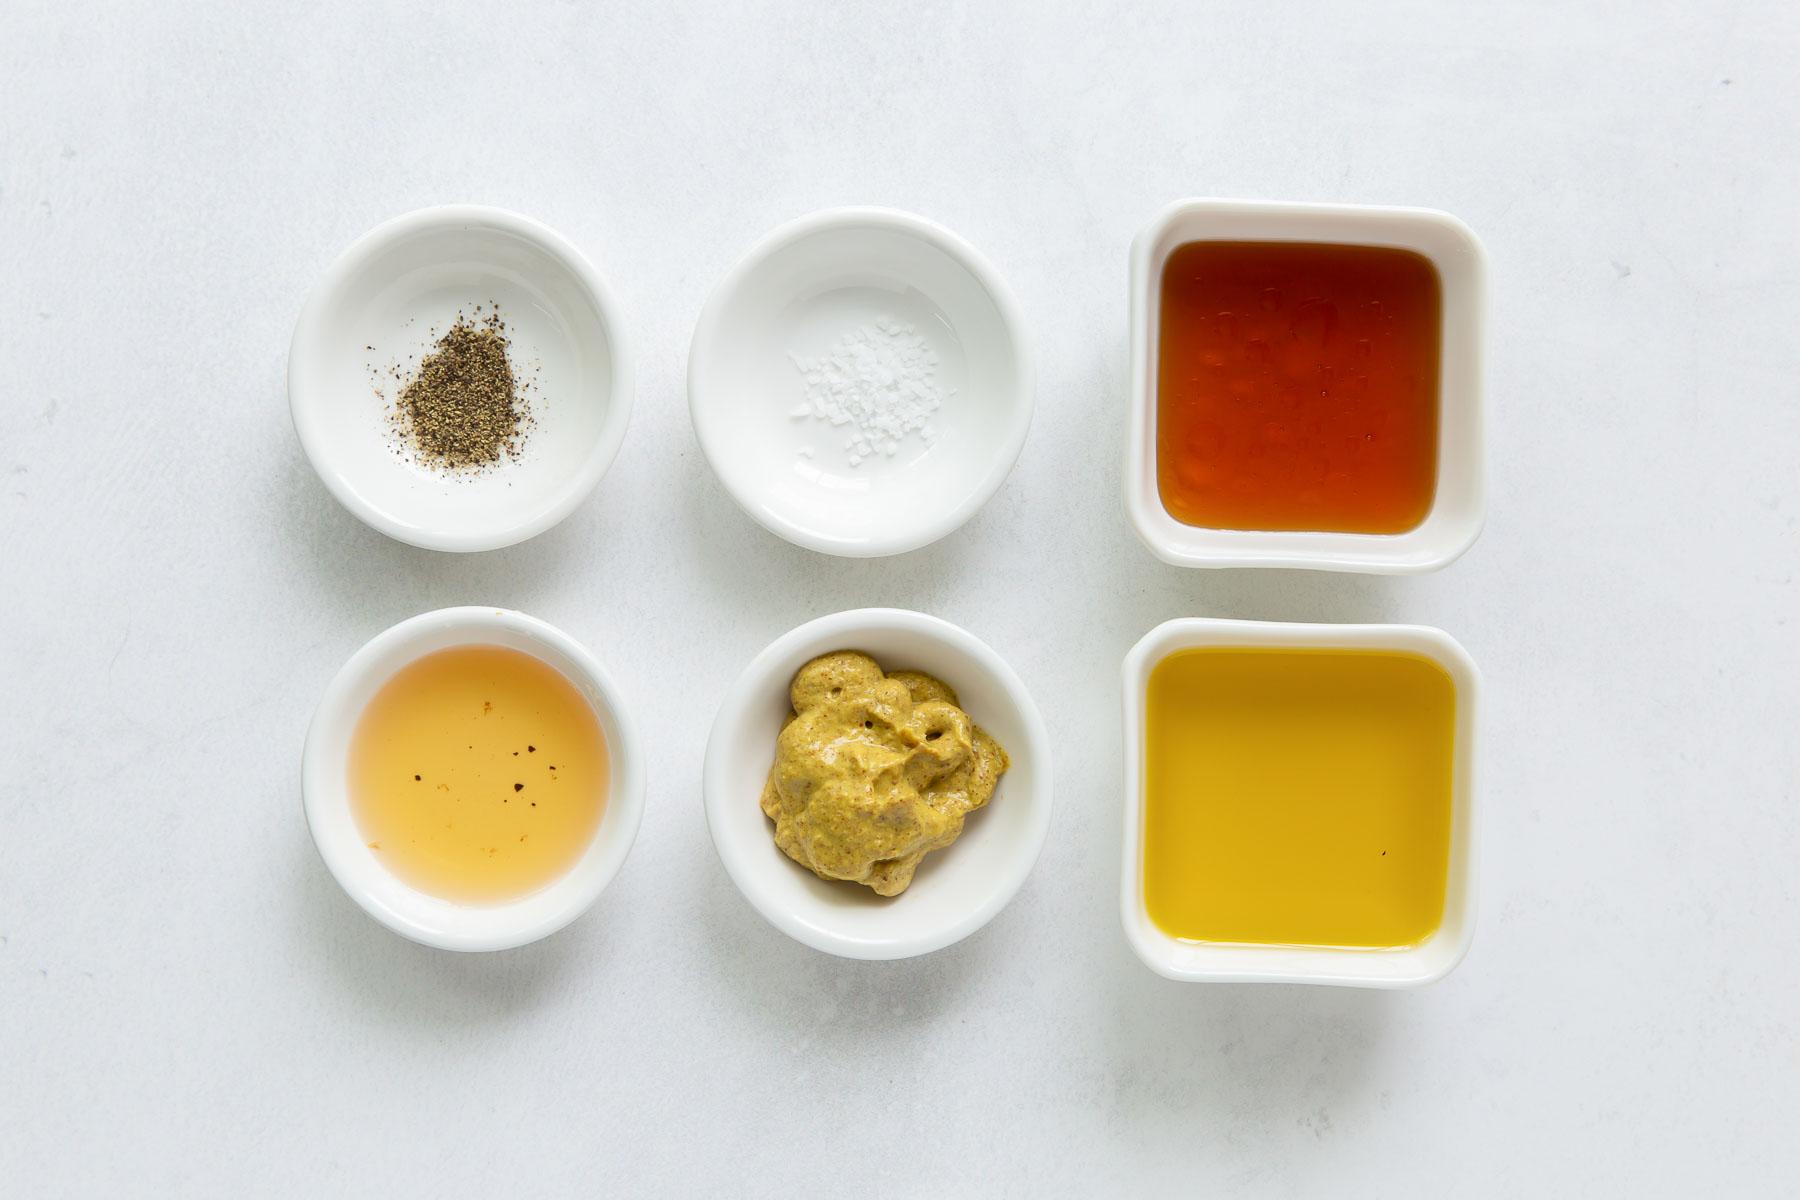 ingredients for honey mustard dressing recipe